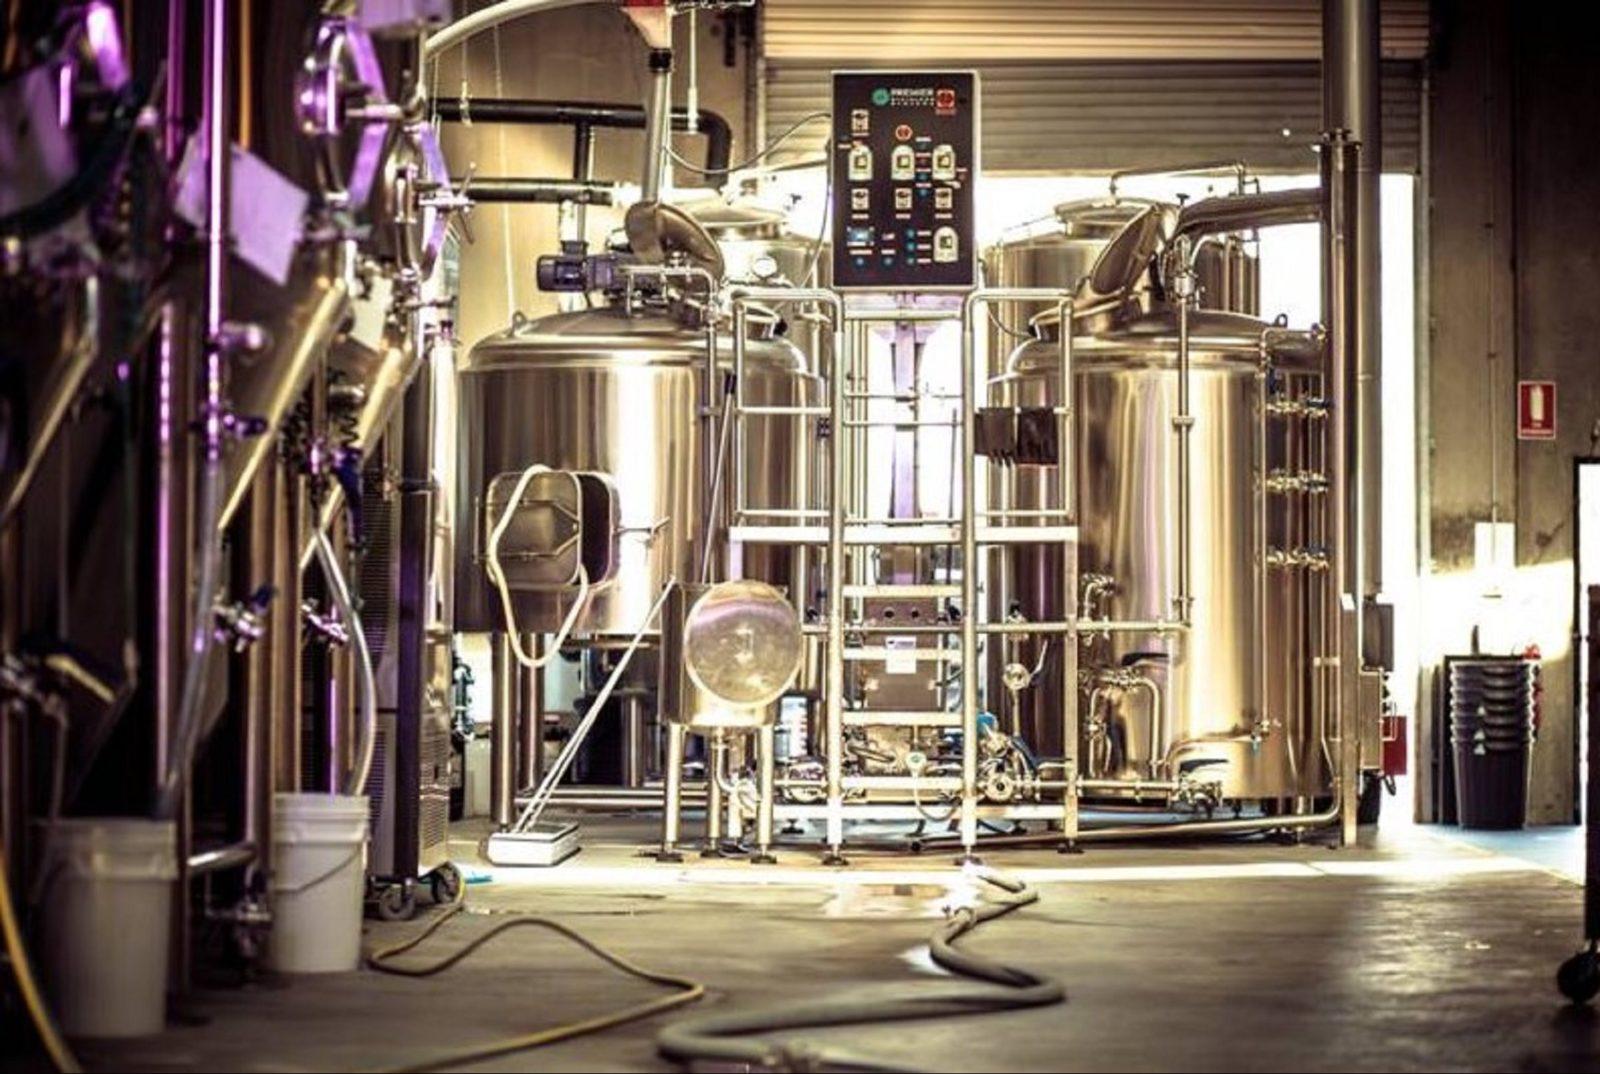 Six String Brewery